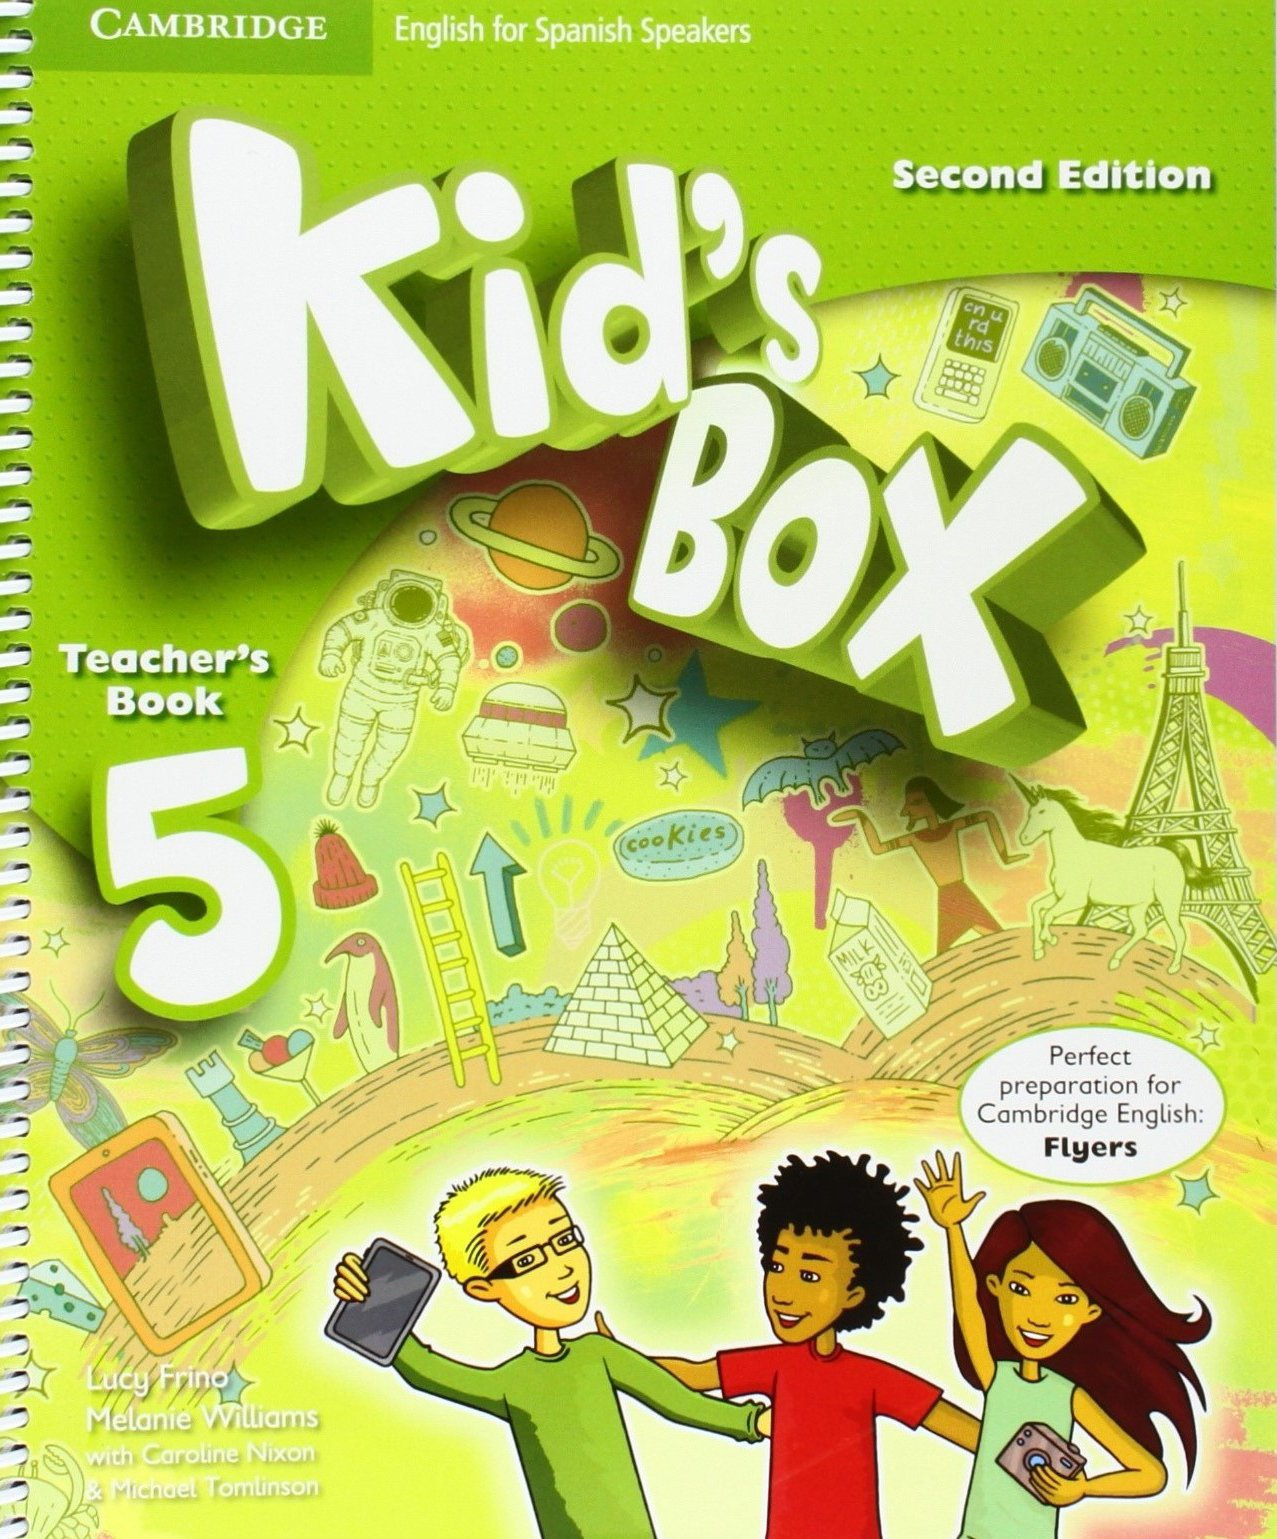 Kid's Box for Spanish Speakers Second Edition Level 5 Teacher's Book -  9788490364406: Amazon.es: Lucy Frino, Melanie Williams, Caroline Nixon, ...